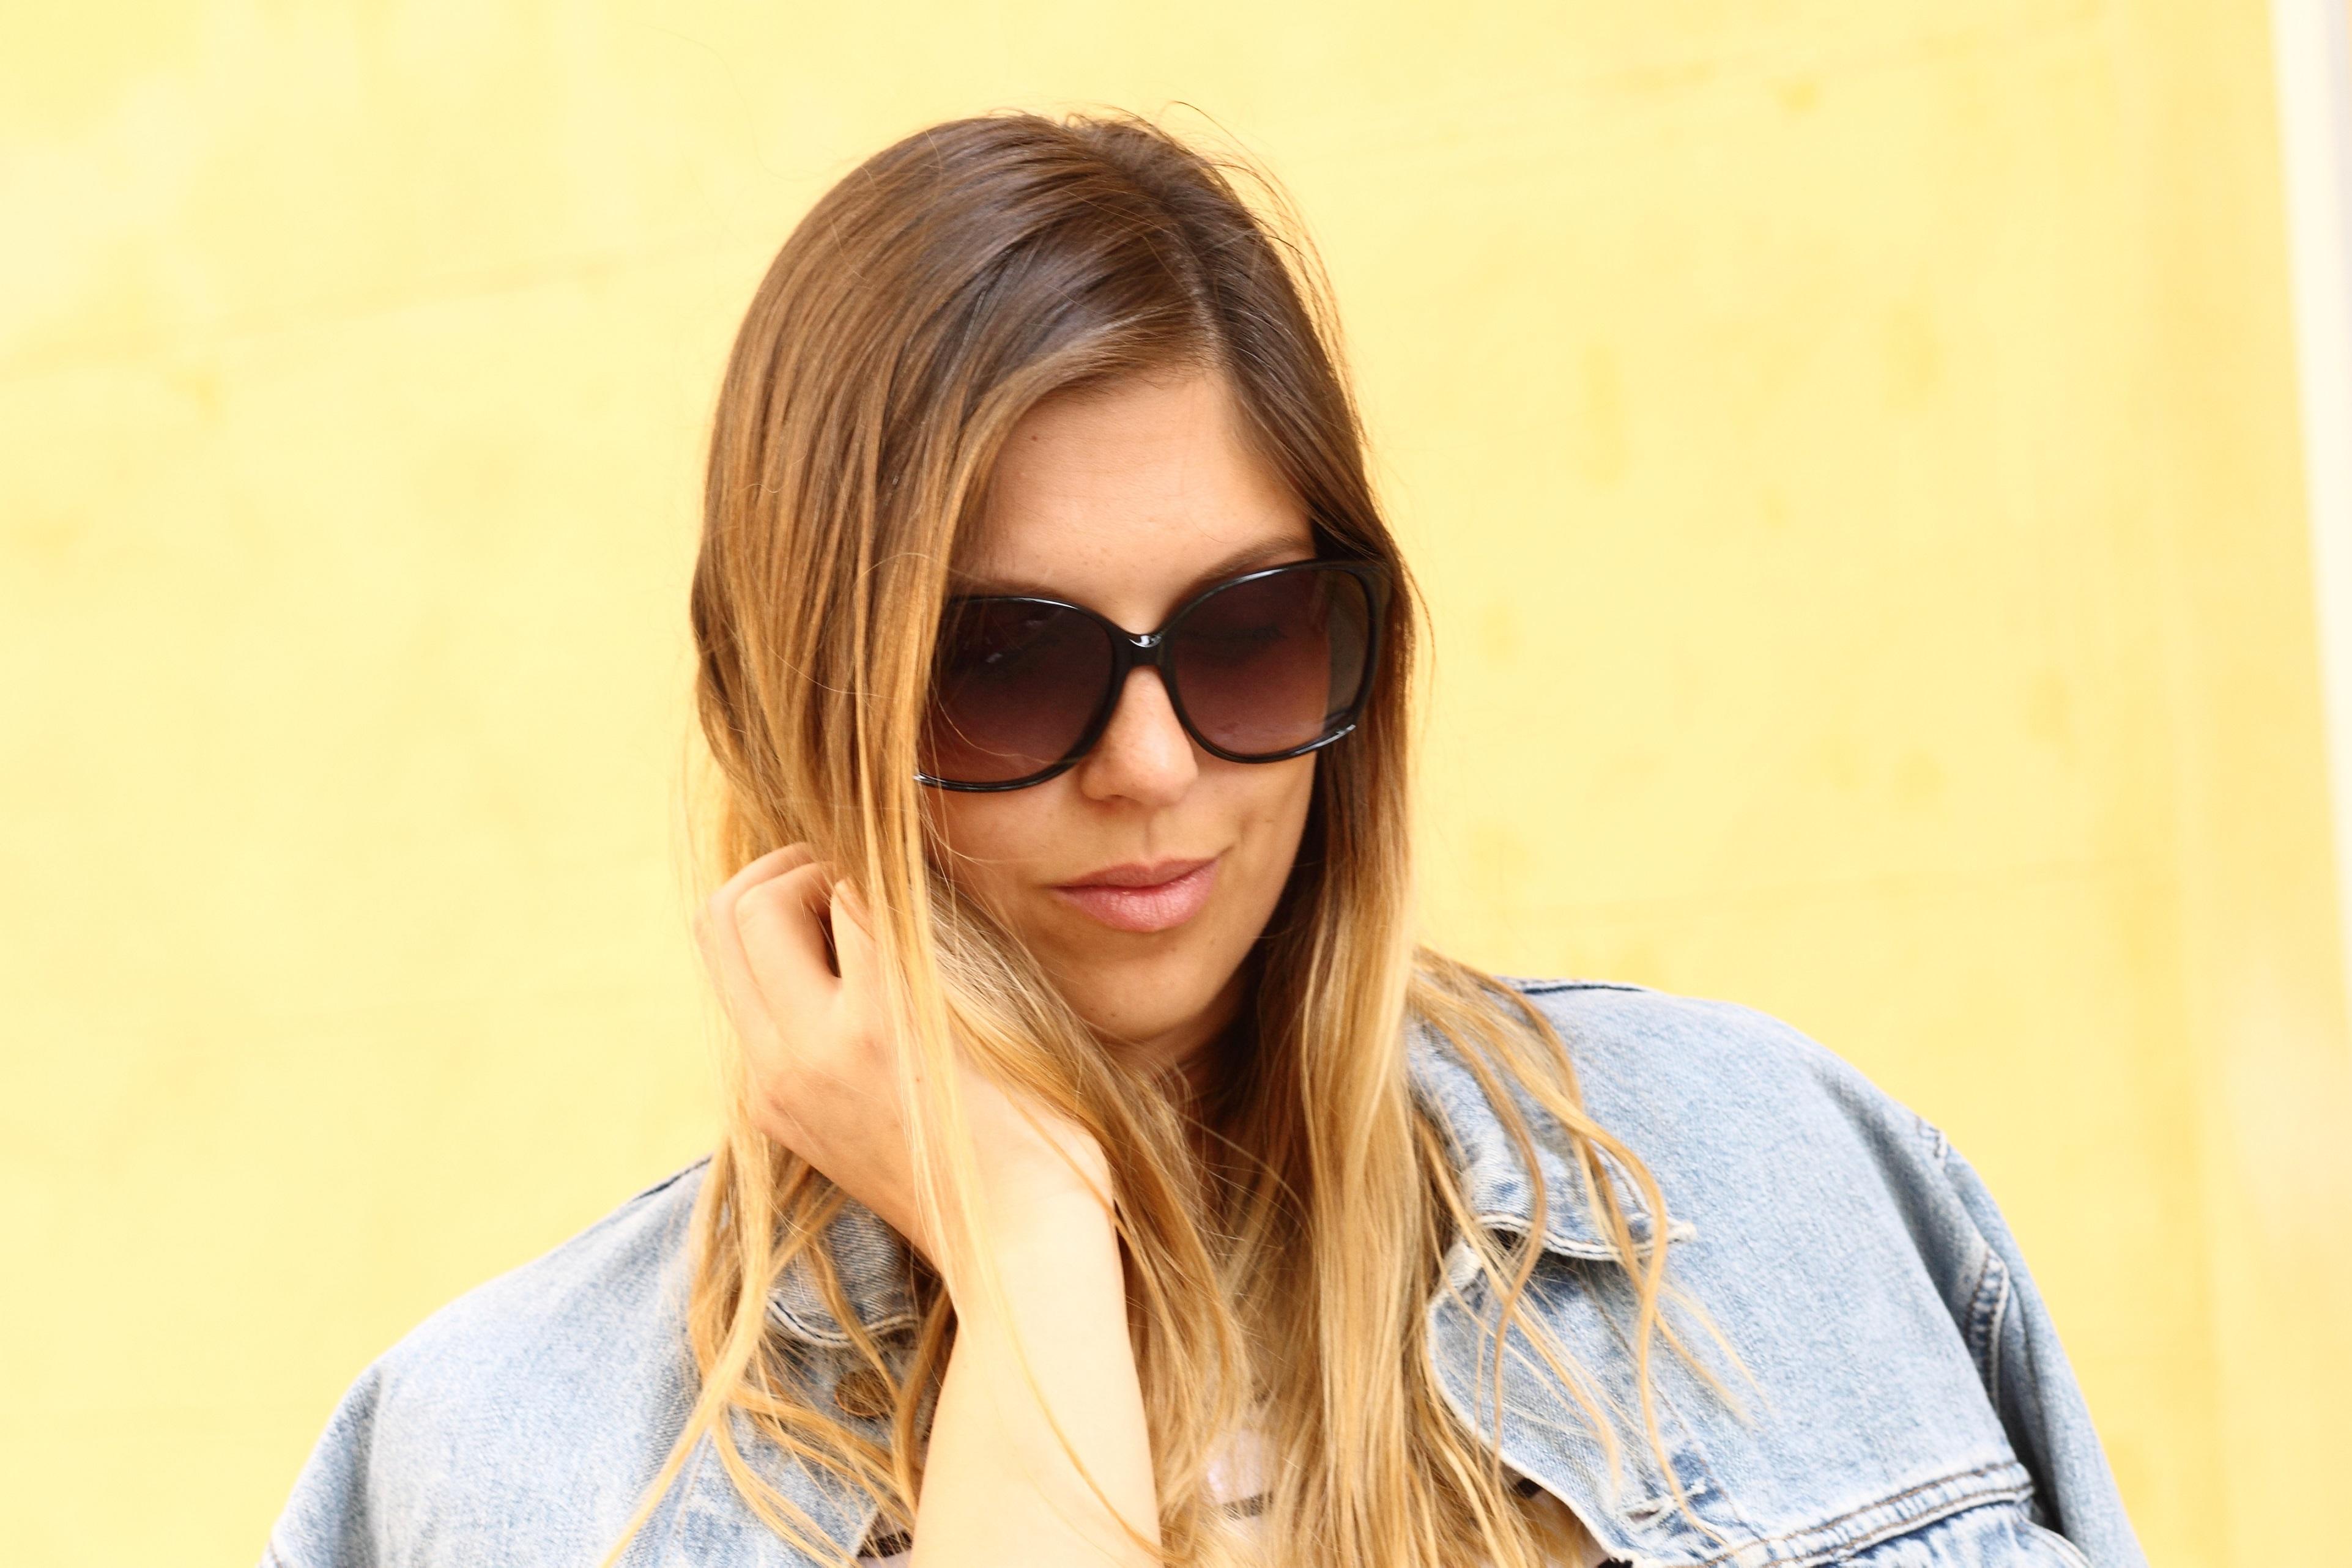 missoni sunglasses close up denim jacket